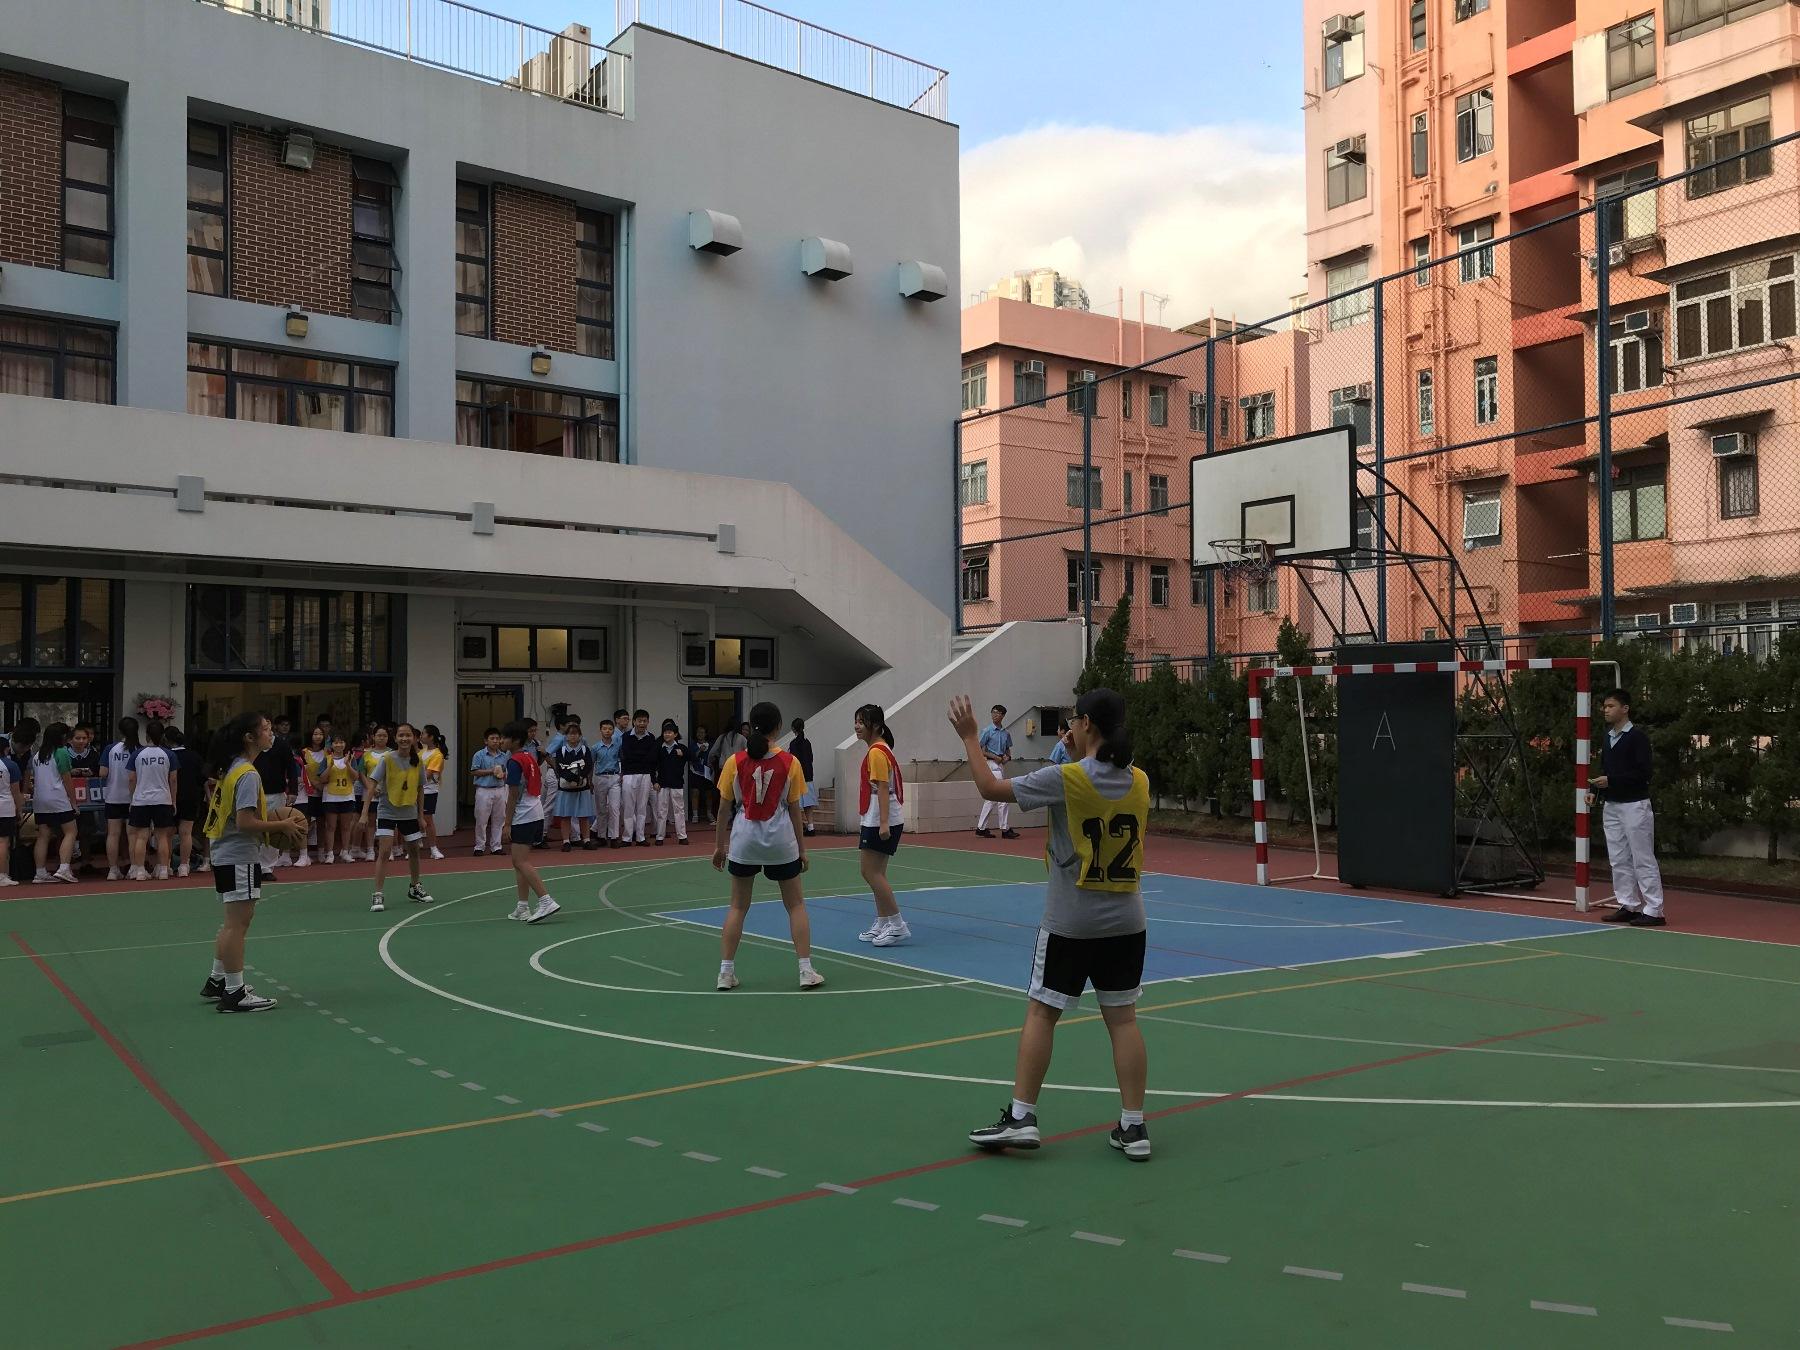 http://npc.edu.hk/sites/default/files/img_0607.jpg